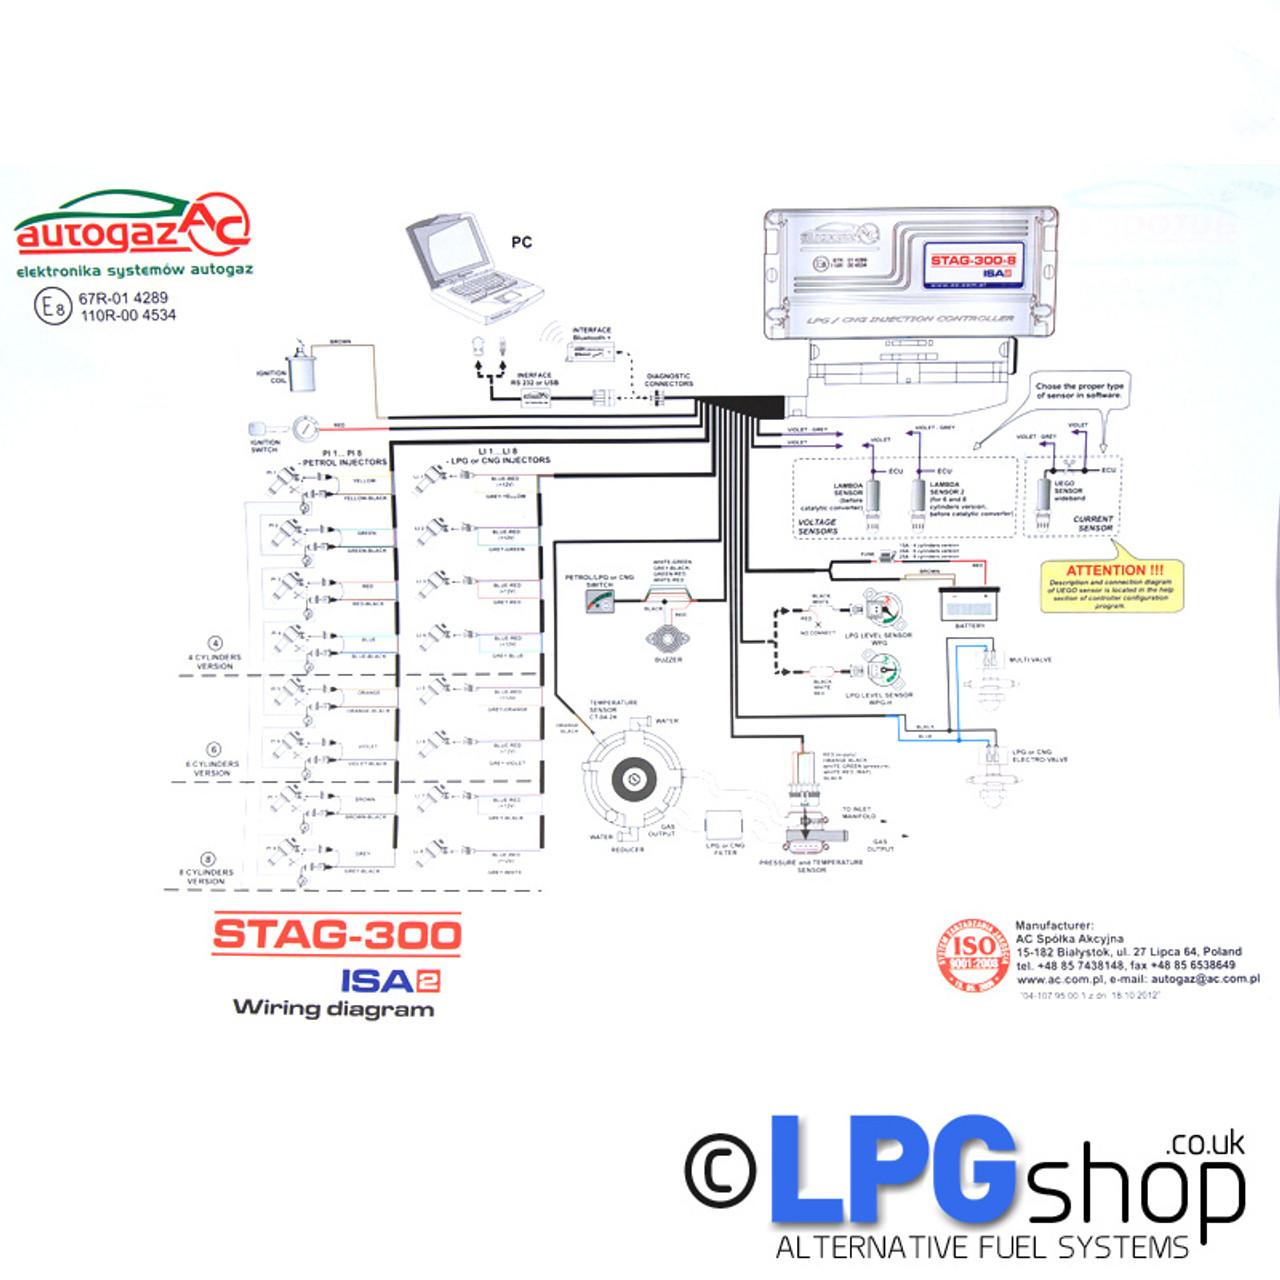 medium resolution of beam propane conversion wiring diagram wiring diagram fascinatingac stag 300 isa2 8 cylinder ecu controller beam